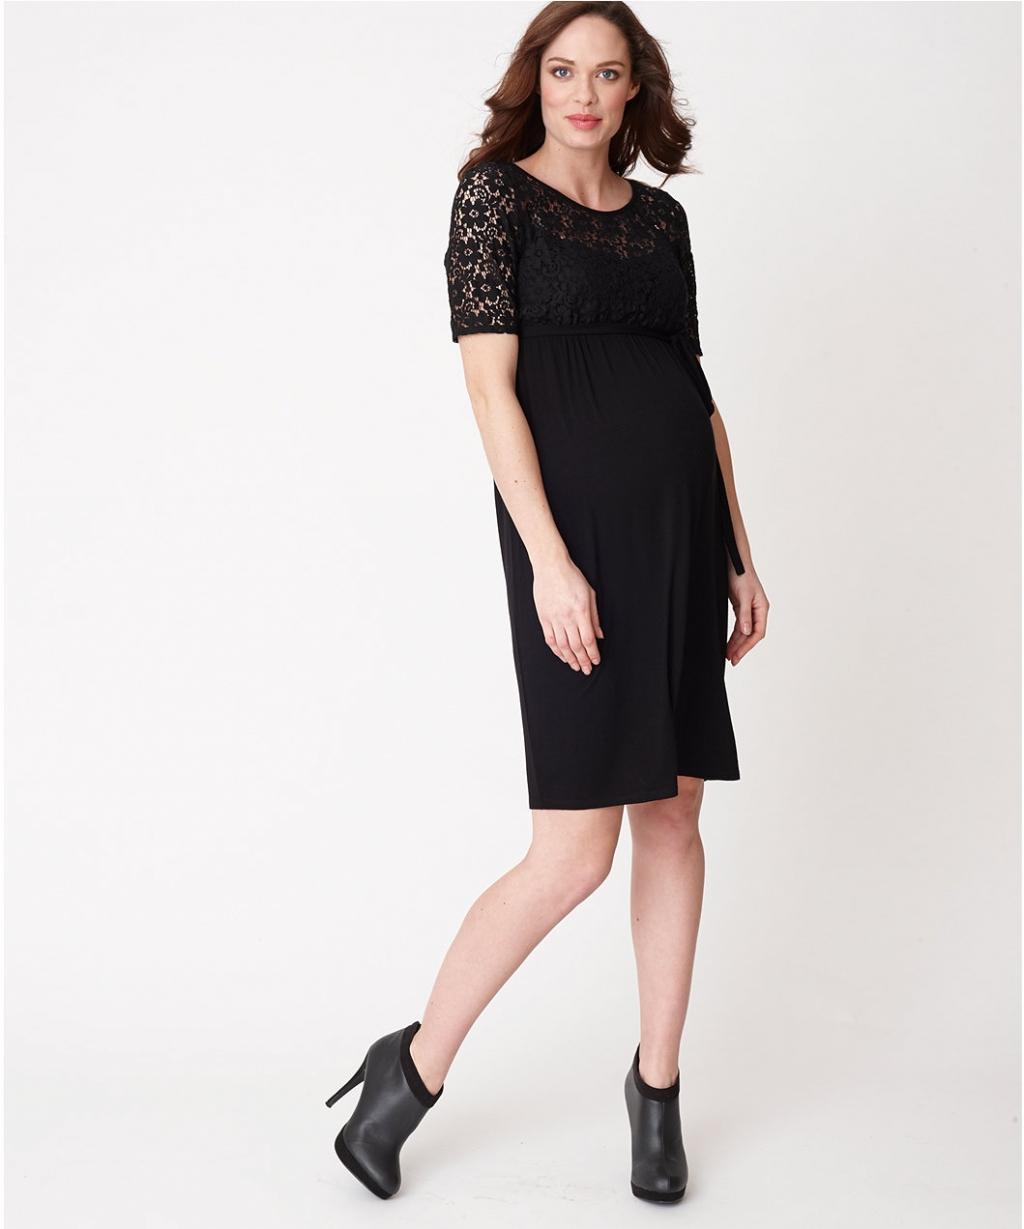 Чорна сукня з мереживом для матусь (Mothercare)